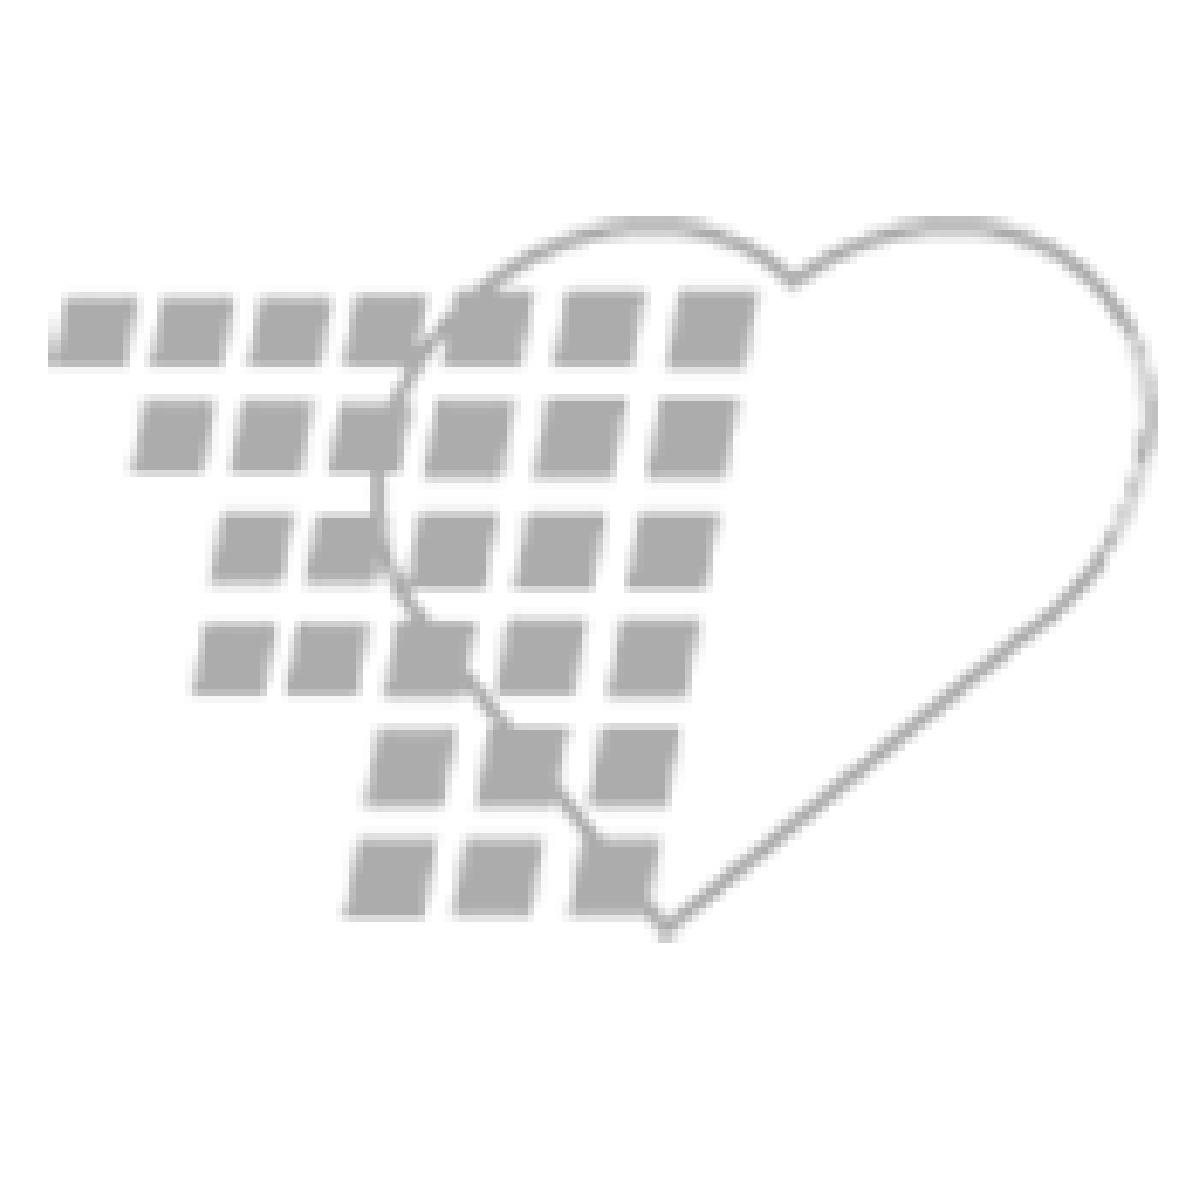 06-93-1164 - Demo Dose® Calcim Chlorid 10% 10 mL 1 g/10 mL